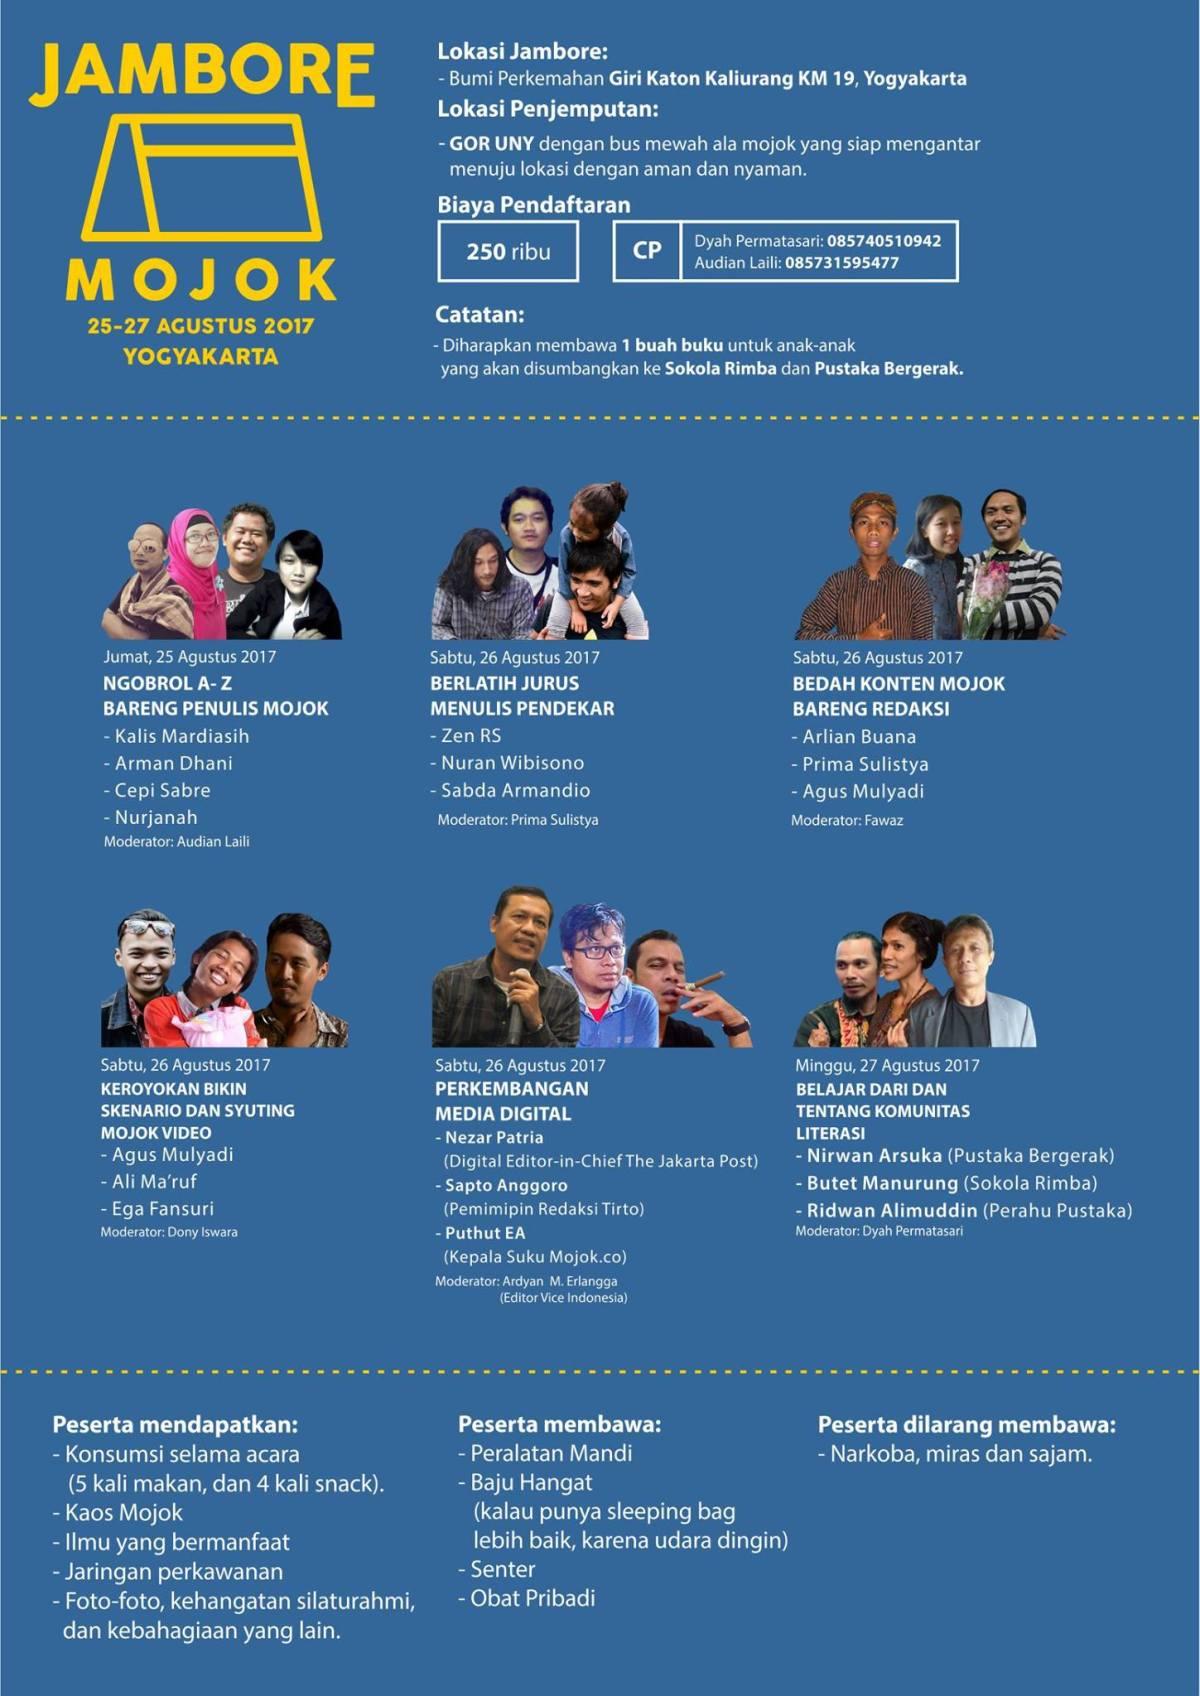 Jambore Mojok